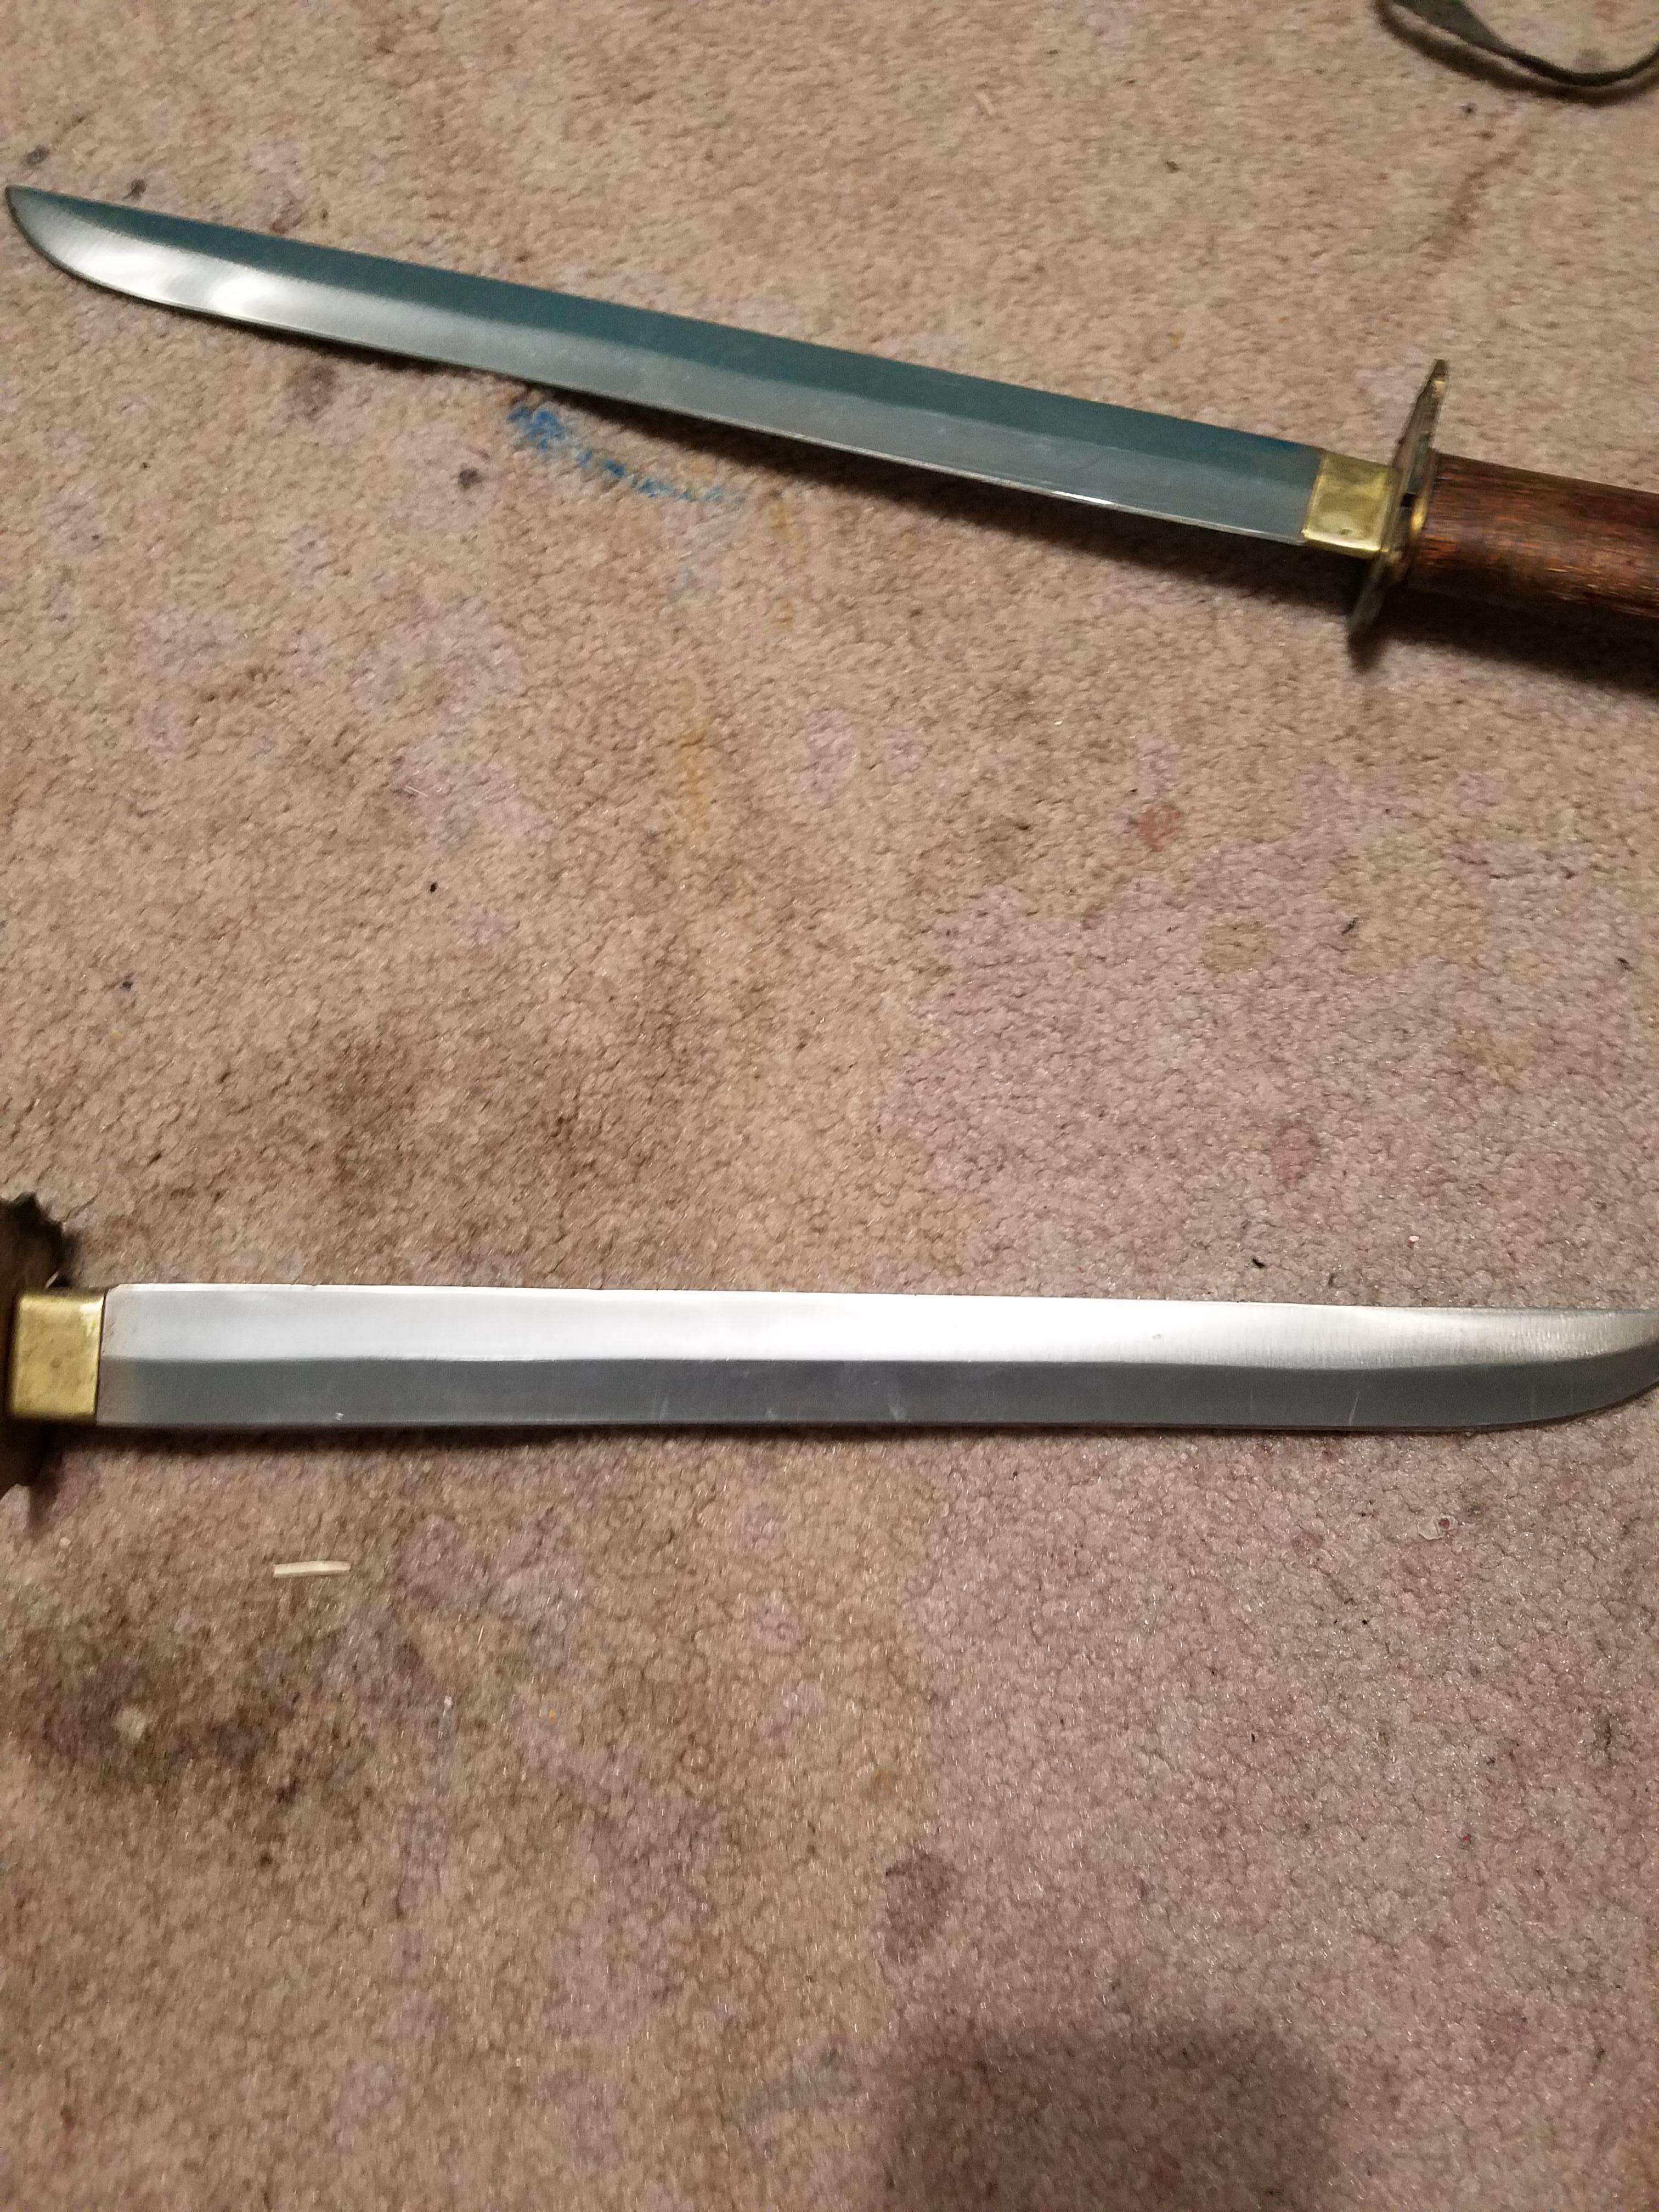 Pakistan Samurai Sword antique appraisal   InstAppraisal